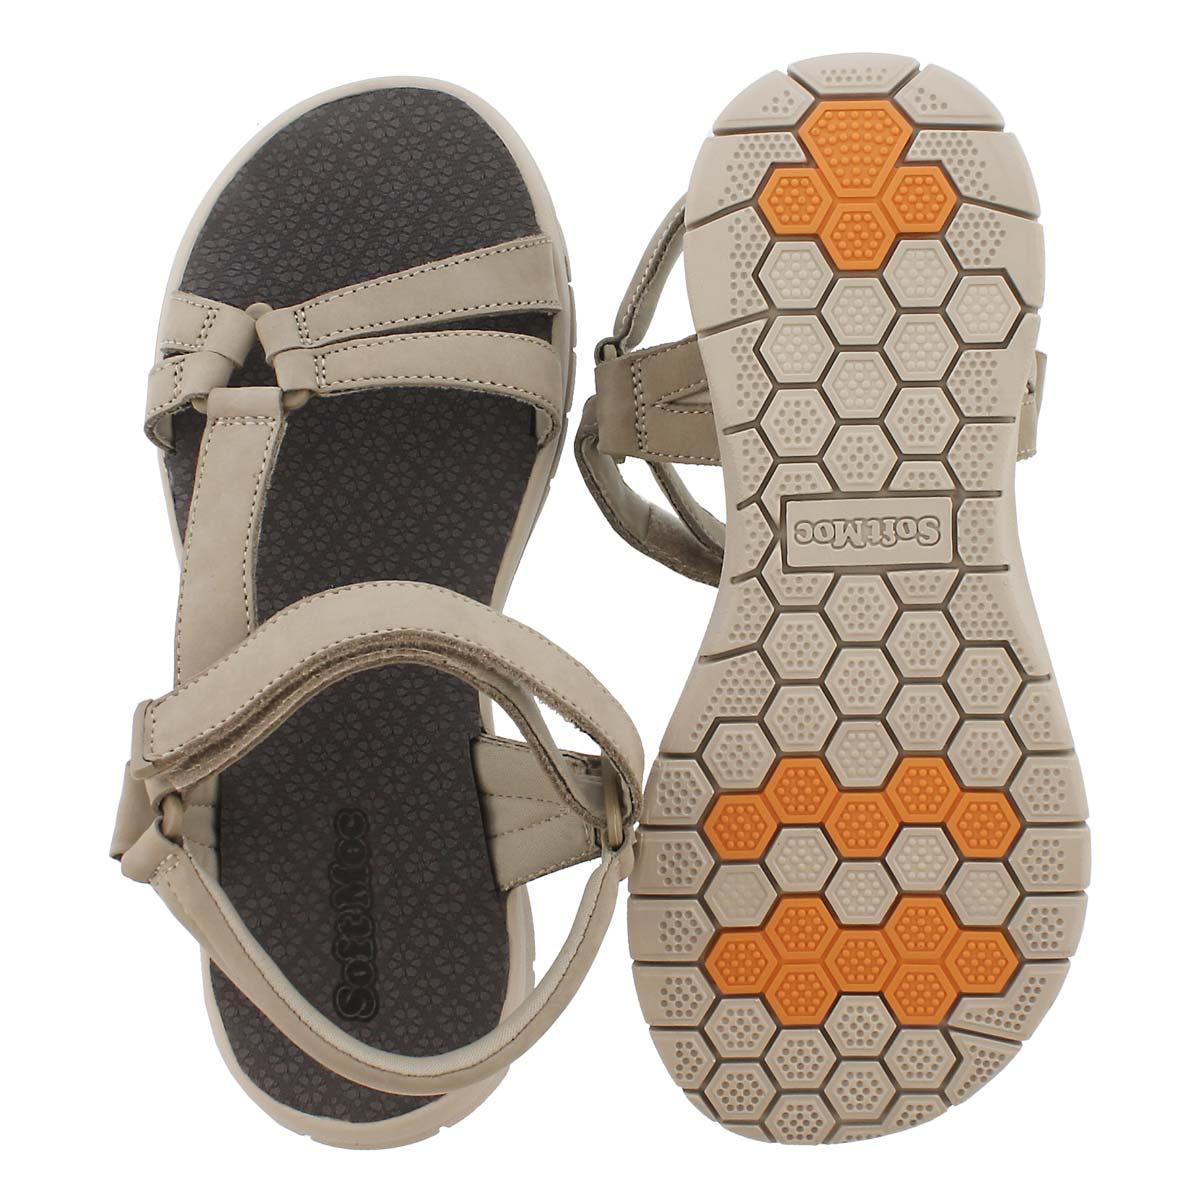 Lds Chrissy stone sport sandal